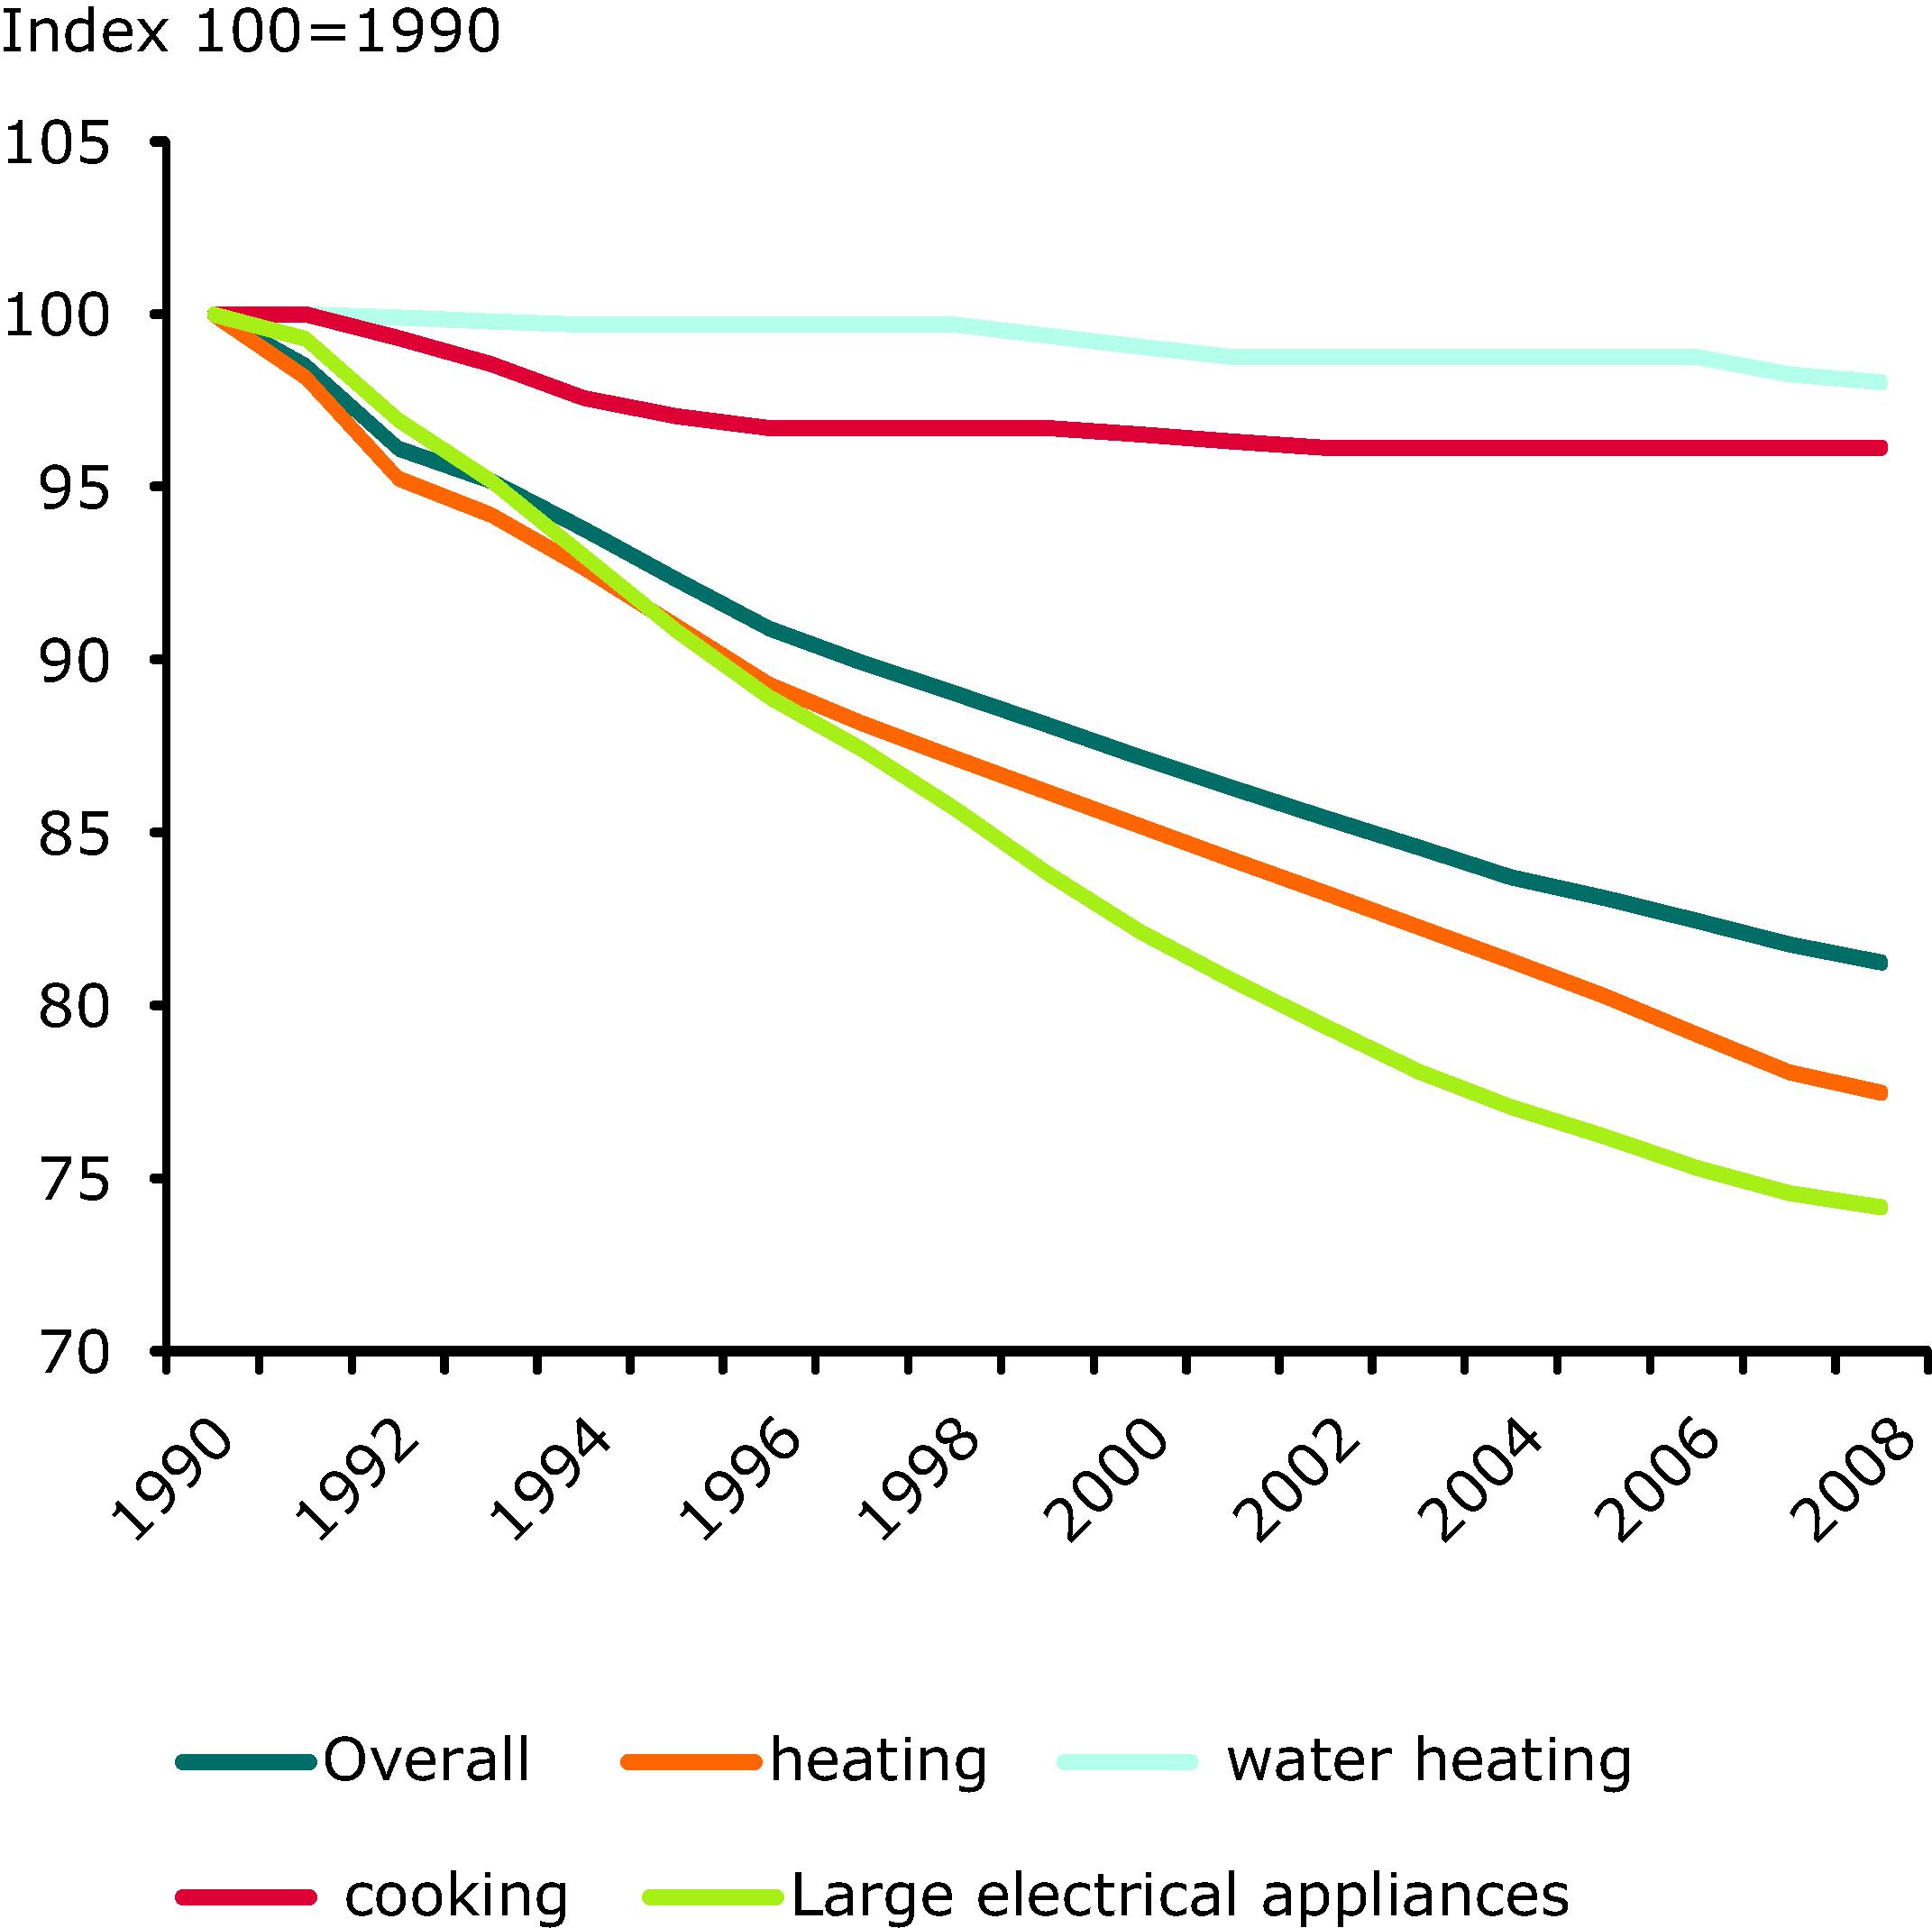 Odyssee energy efficiency index (ODEX) (EU-27)